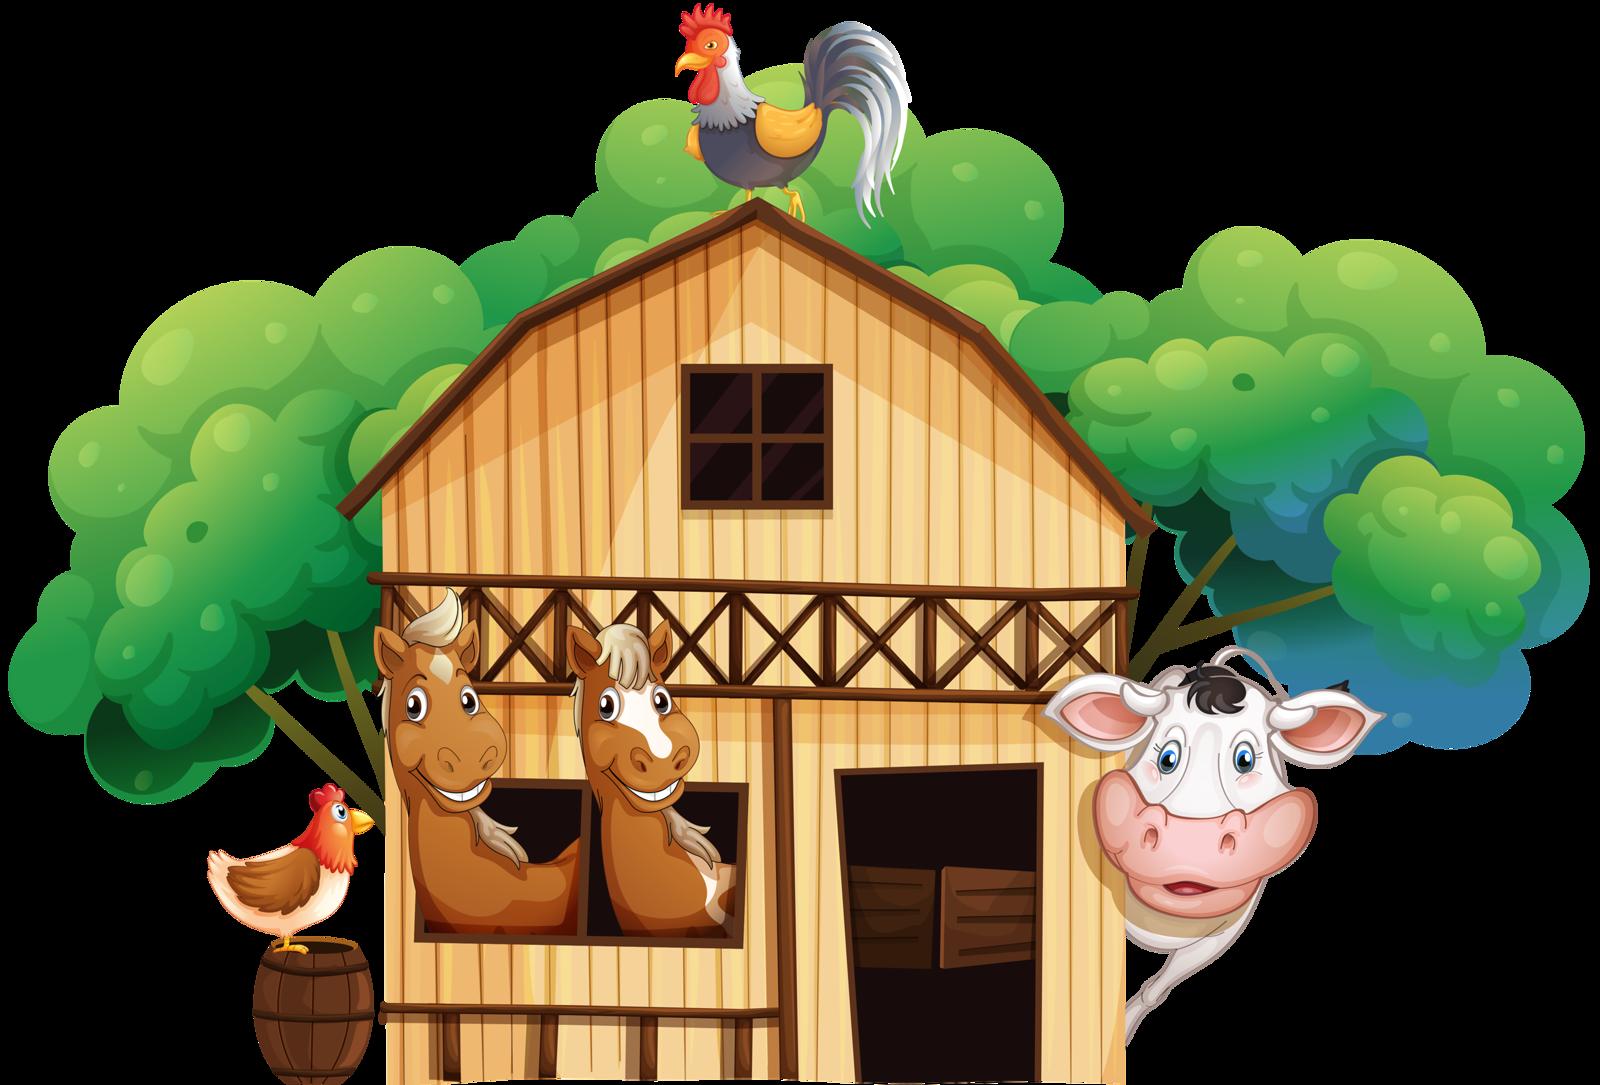 png barn. Farmhouse clipart ranch house